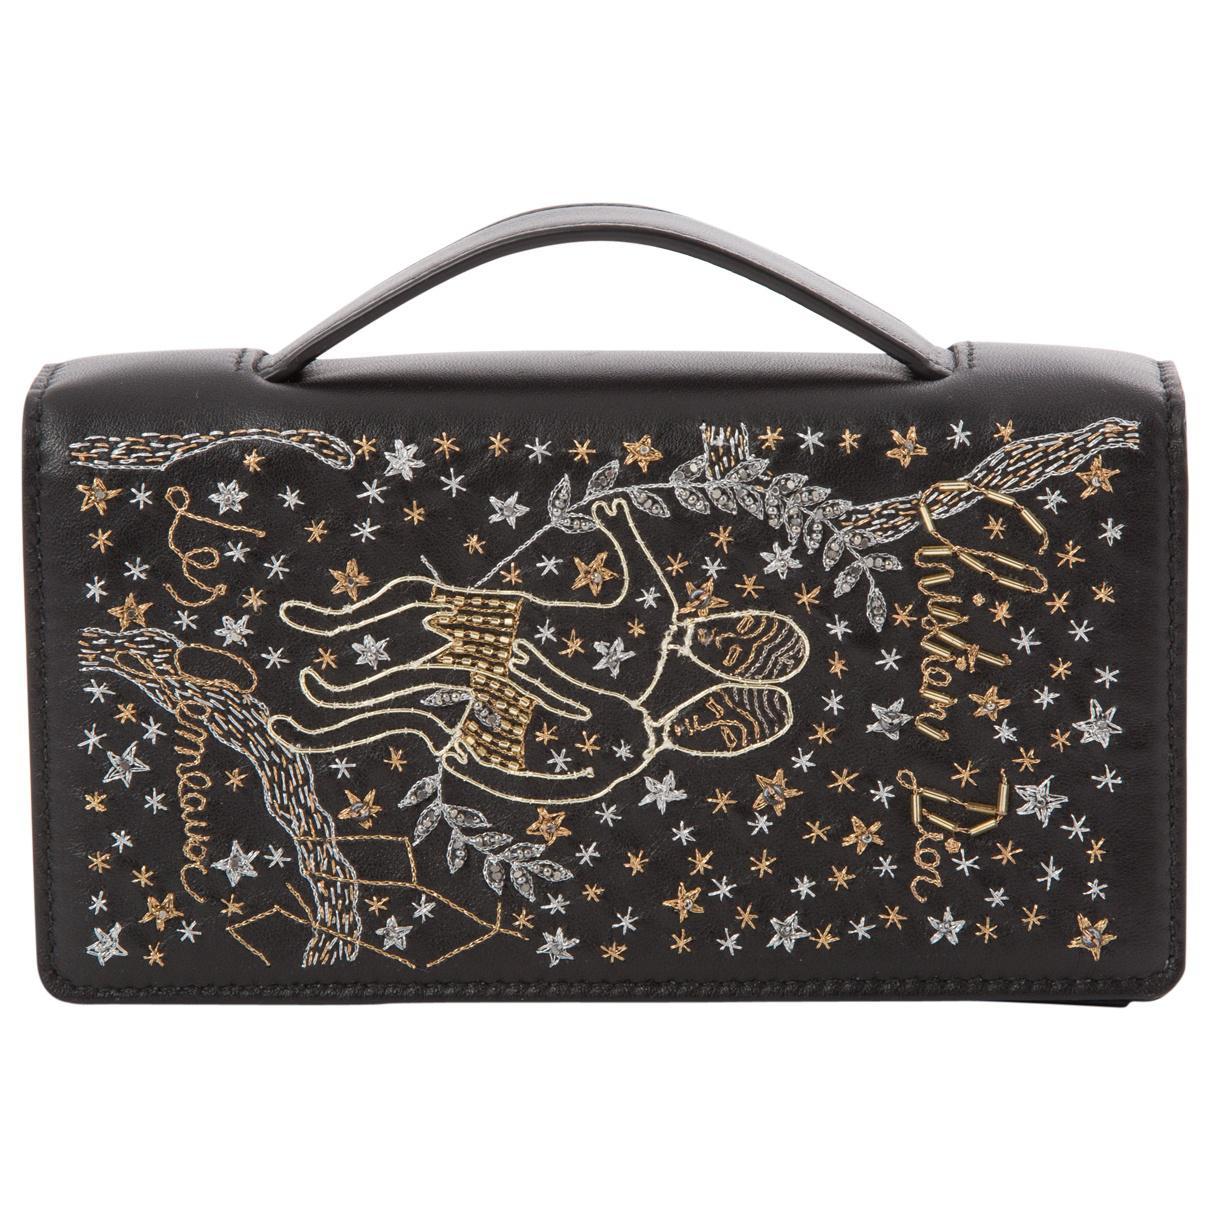 Dior Pre-owned - LEATHER CLUTCH PURSE j3VstjAuL